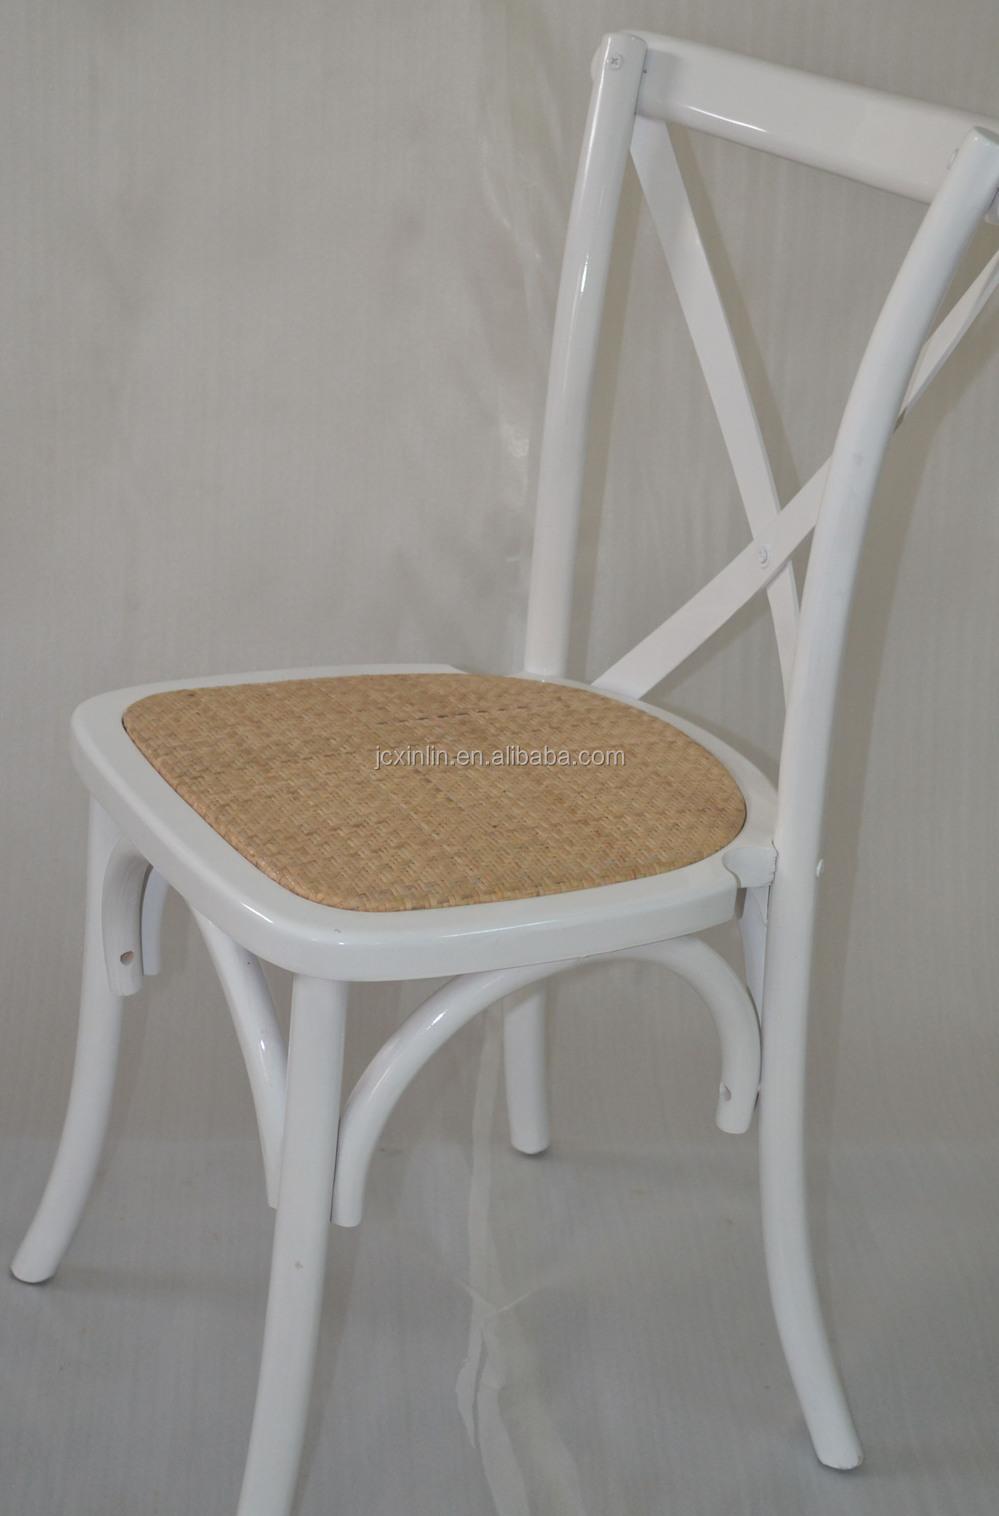 Used Chiavari Chairs wedding Chairstackable Chairs  Buy